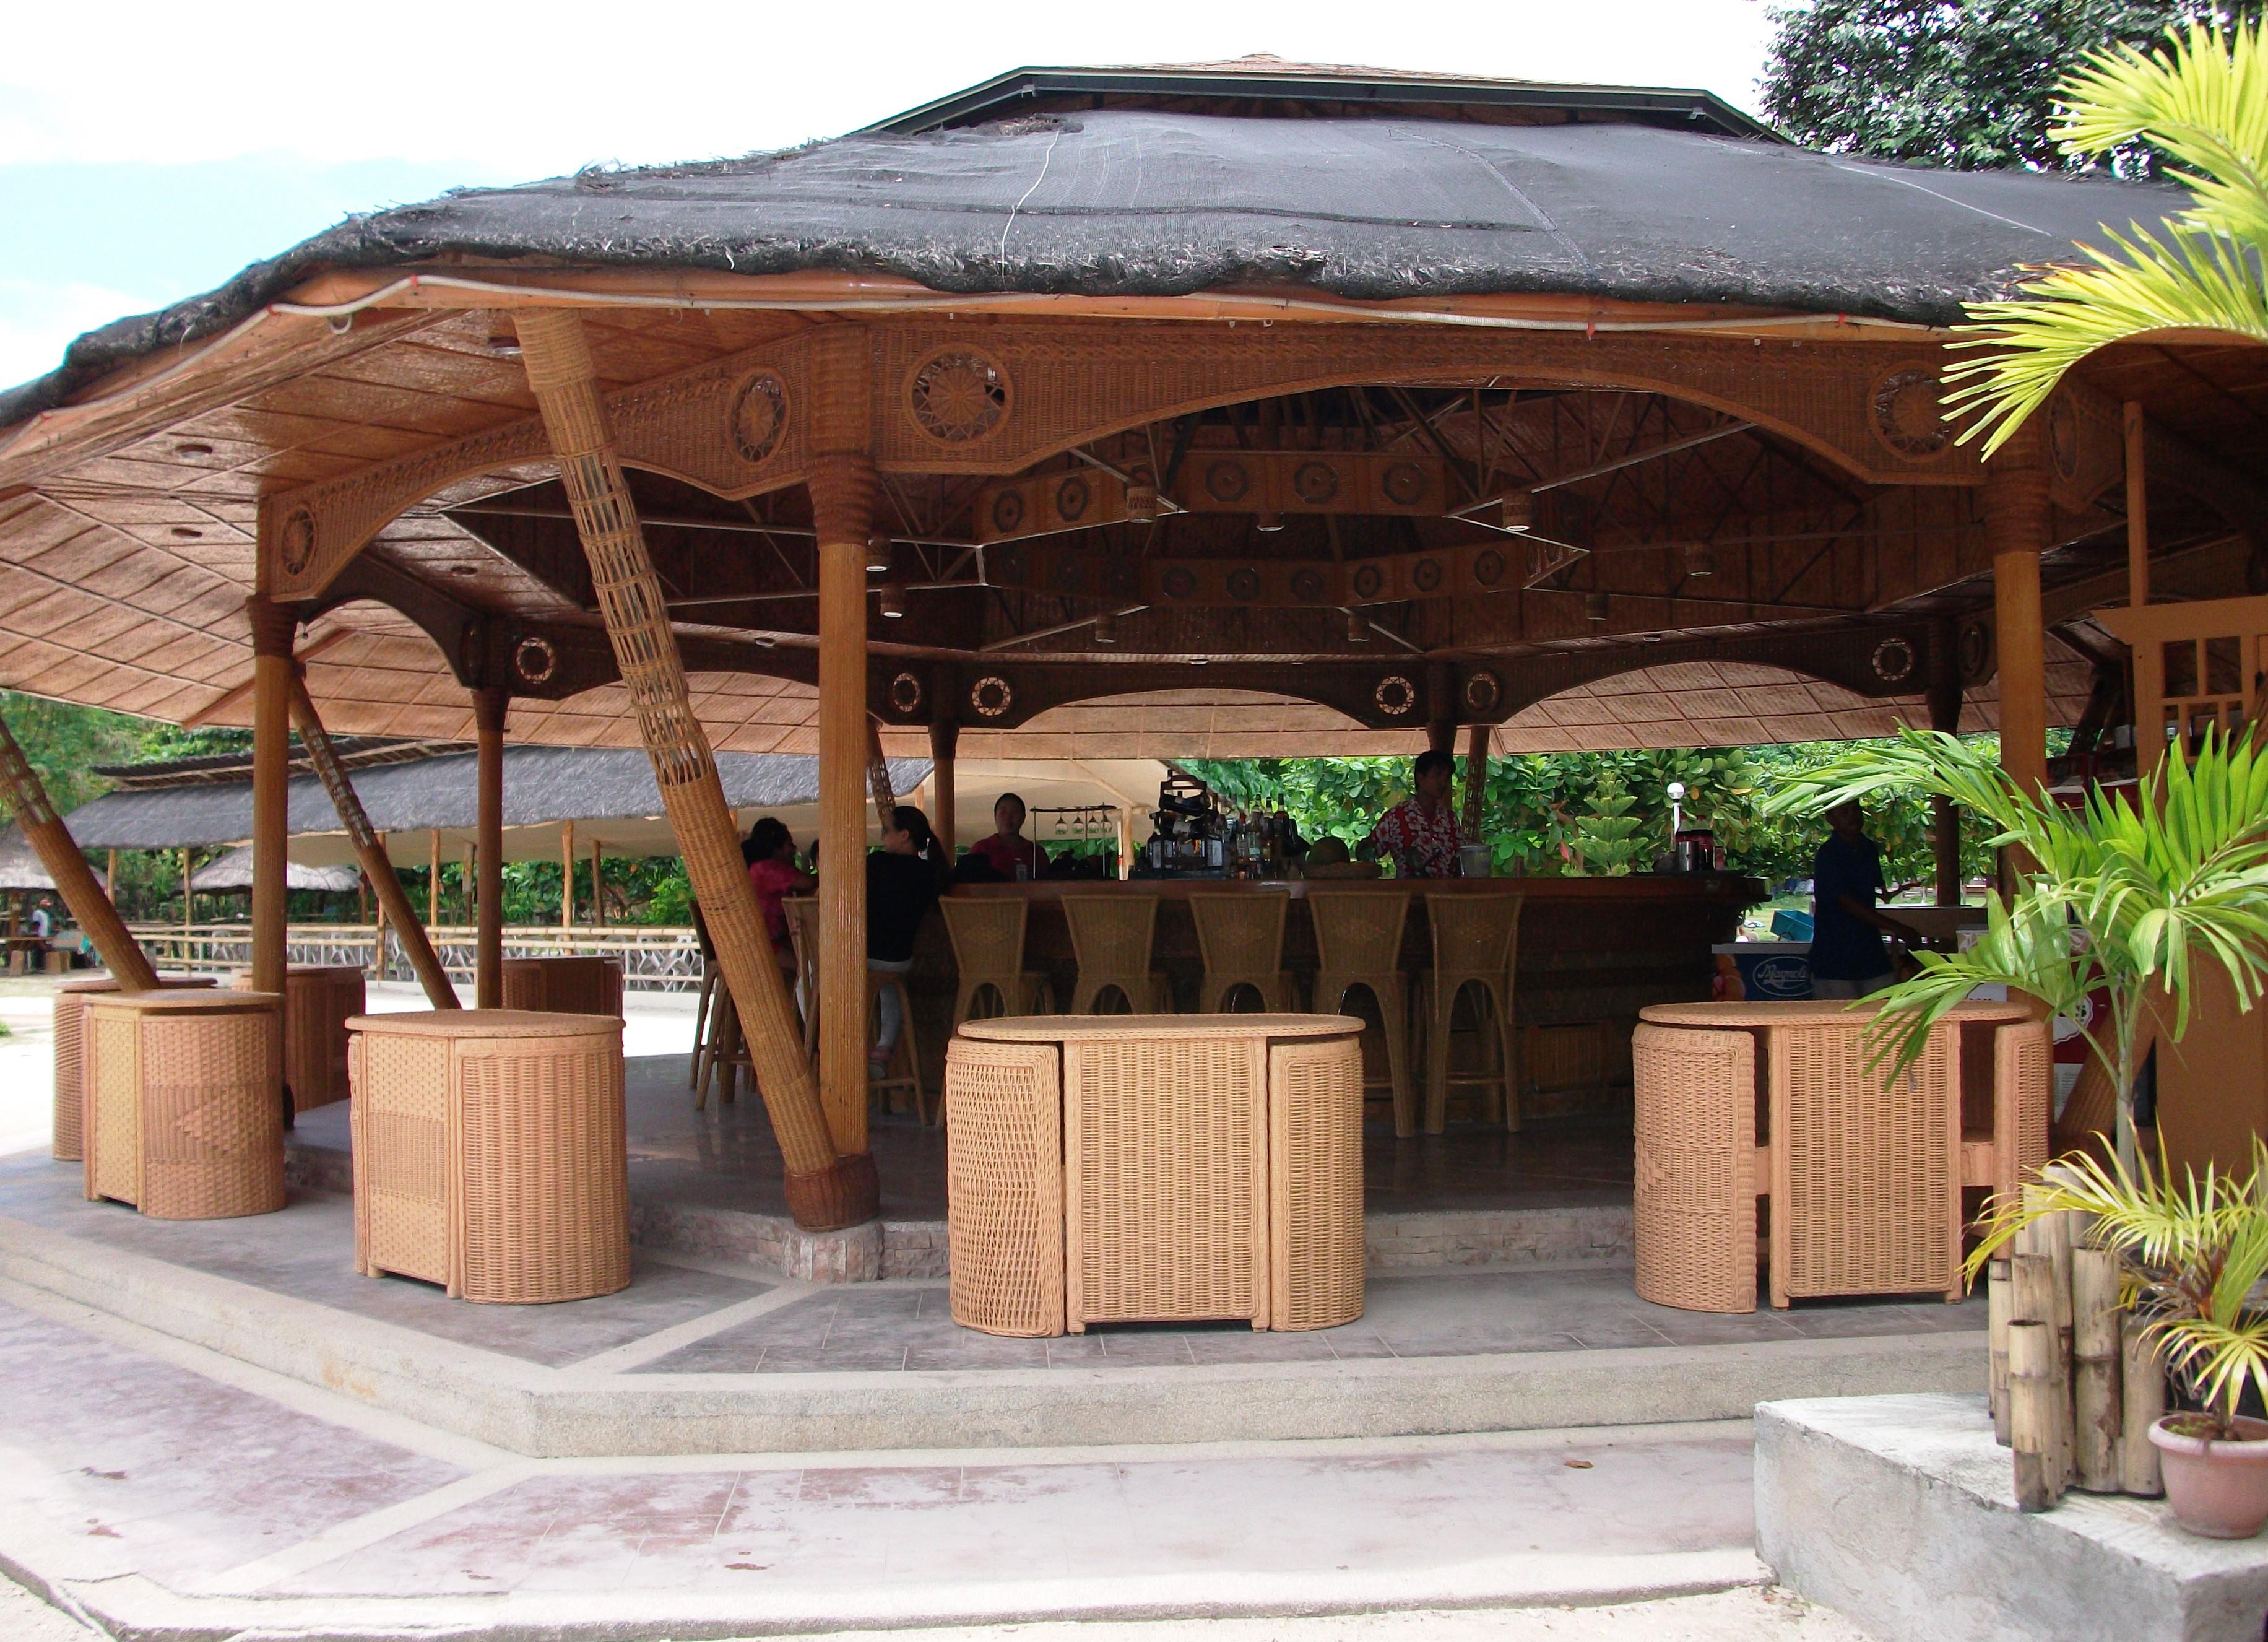 Bahay kubo style restaurants samal bahay kubo for Beach rest house design